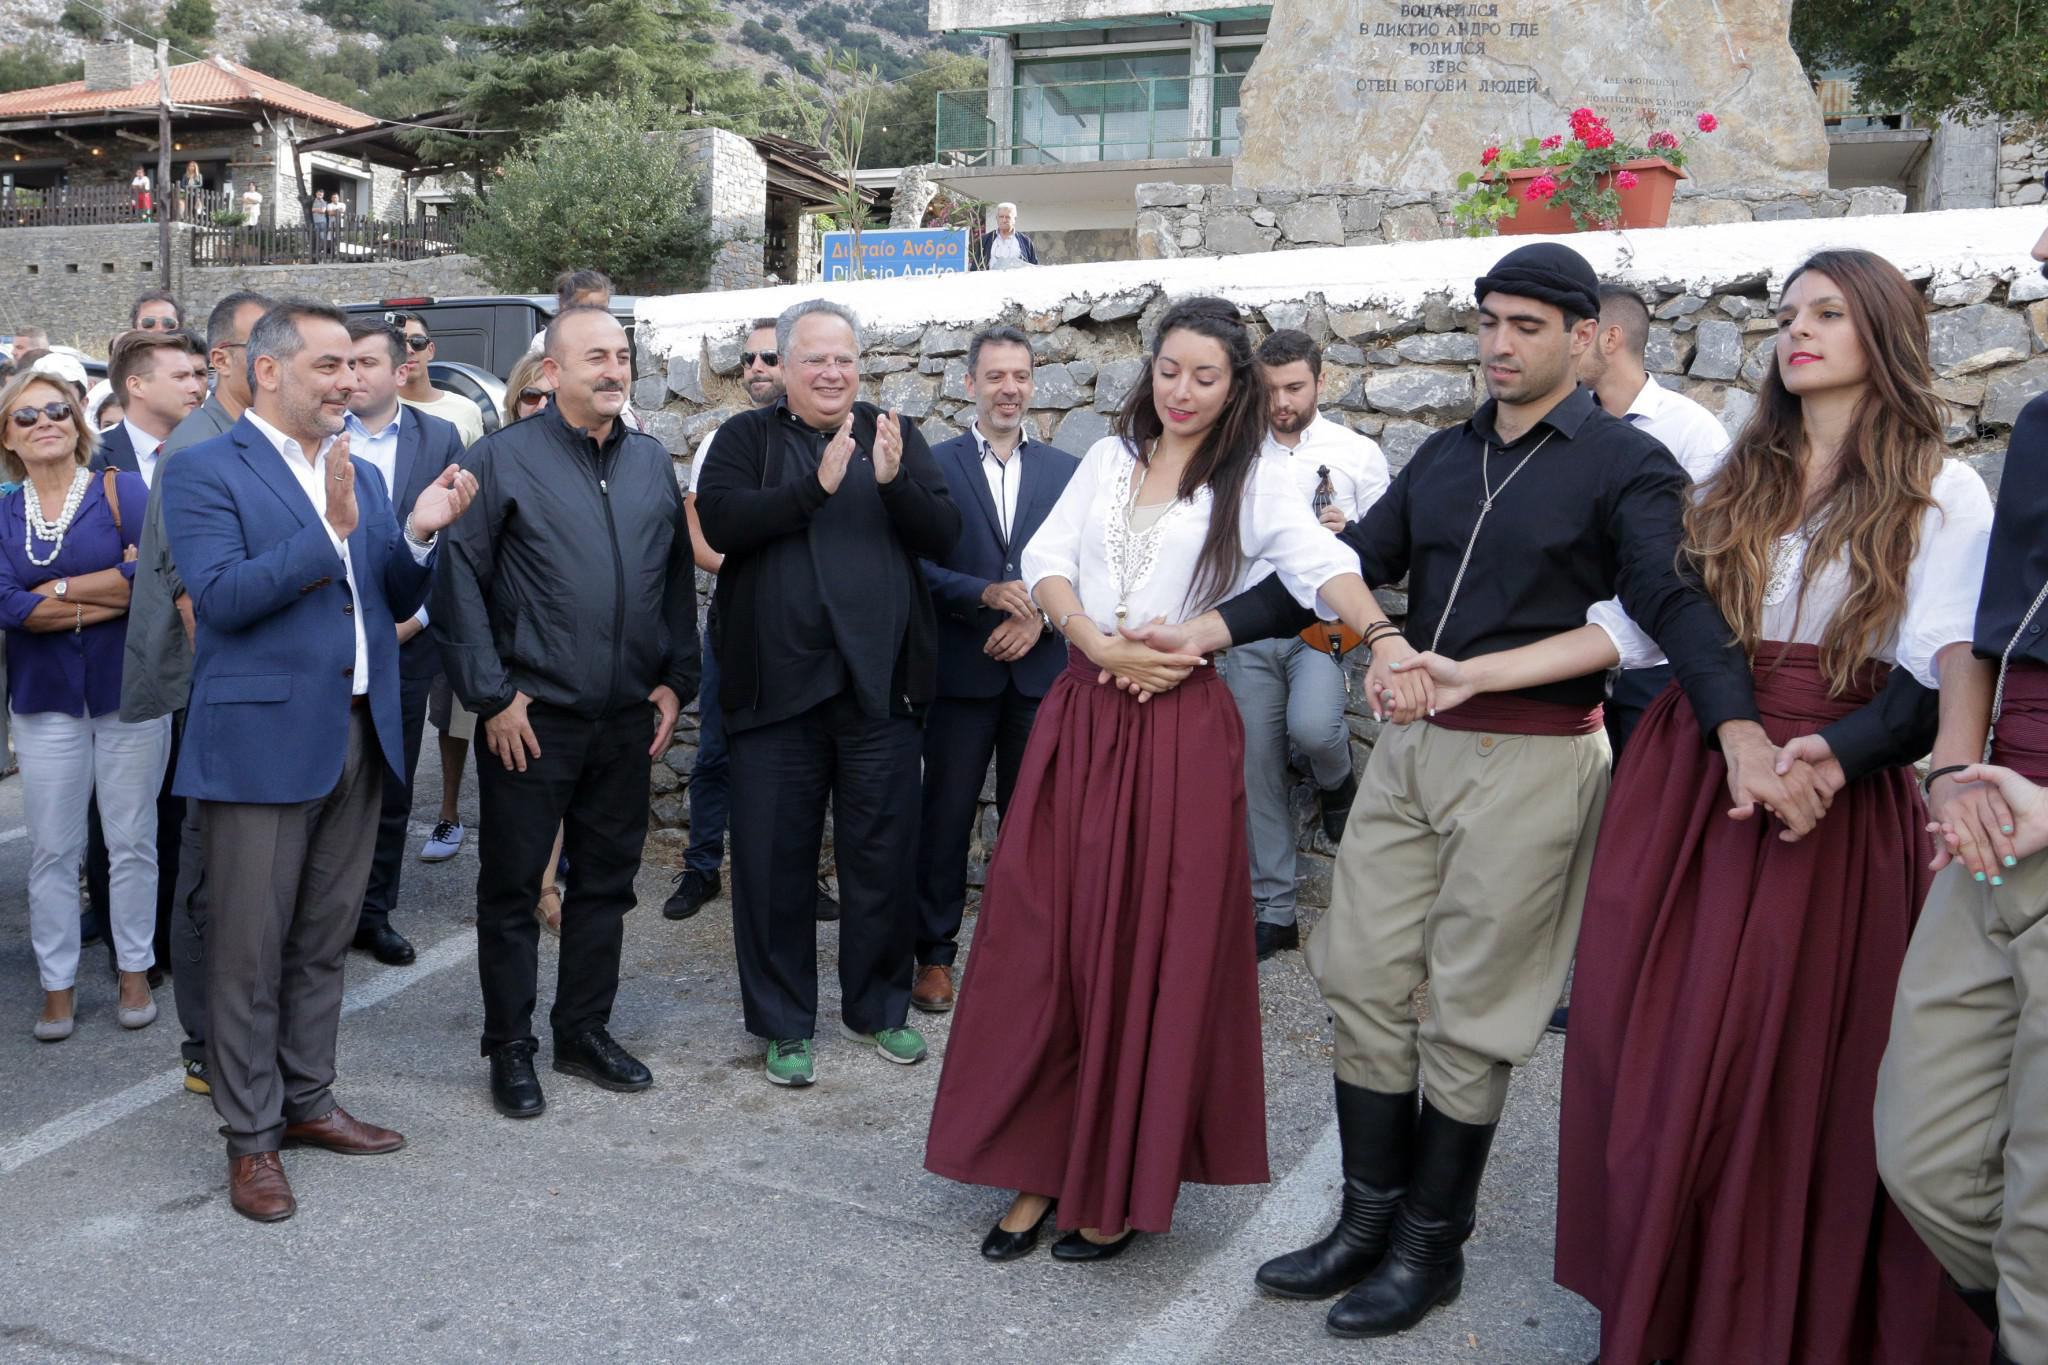 tsavousoglou-kotzias-kriti-1000 Τα... ελληνικά του Τσαβούσογλου και το «ευχαριστώ» για τη φιλοξενία στην Κρήτη [εικόνες]